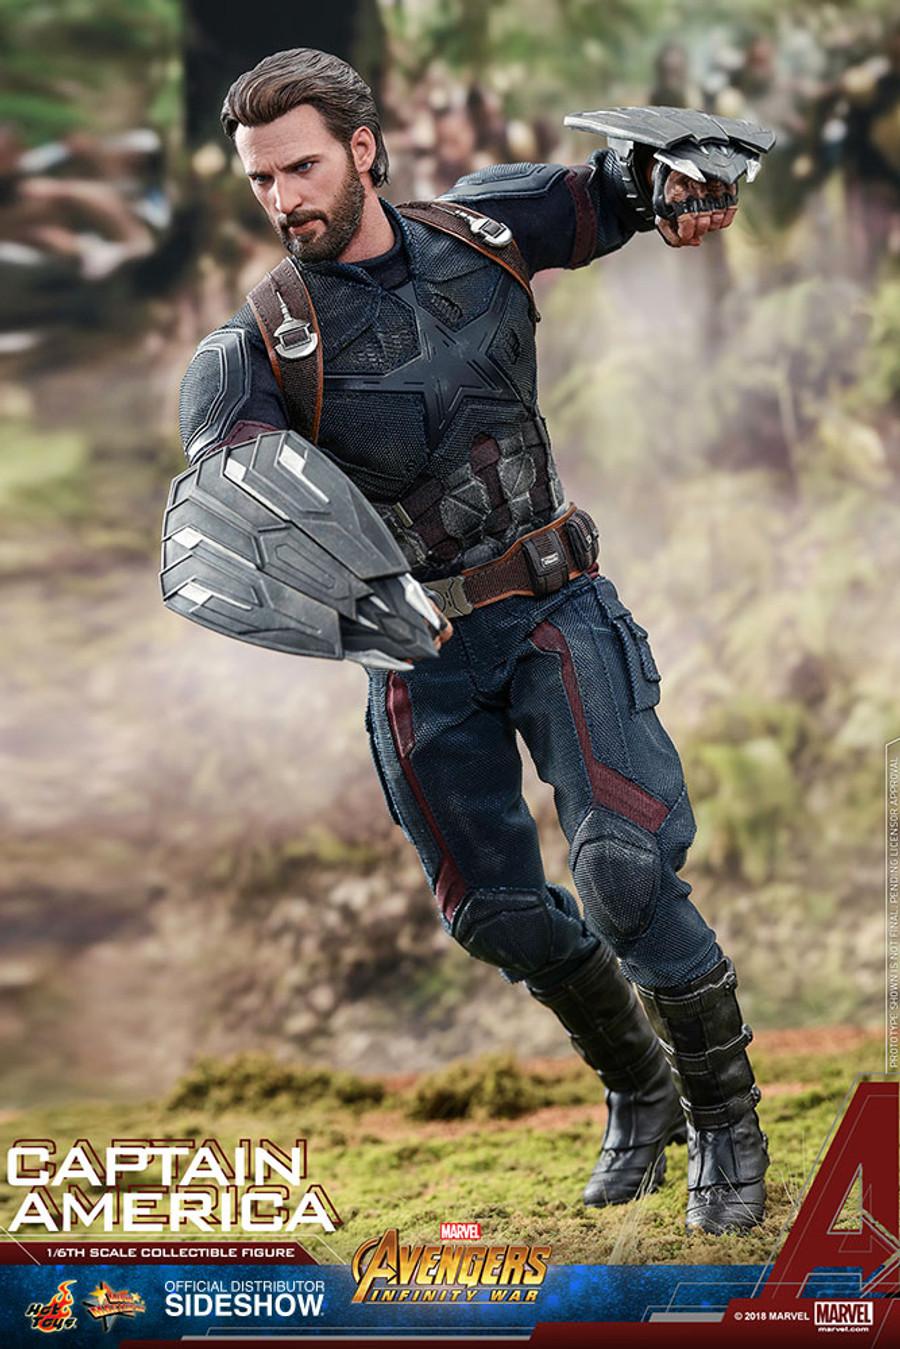 Hot Toys - Avengers: Infinity War - Captain America